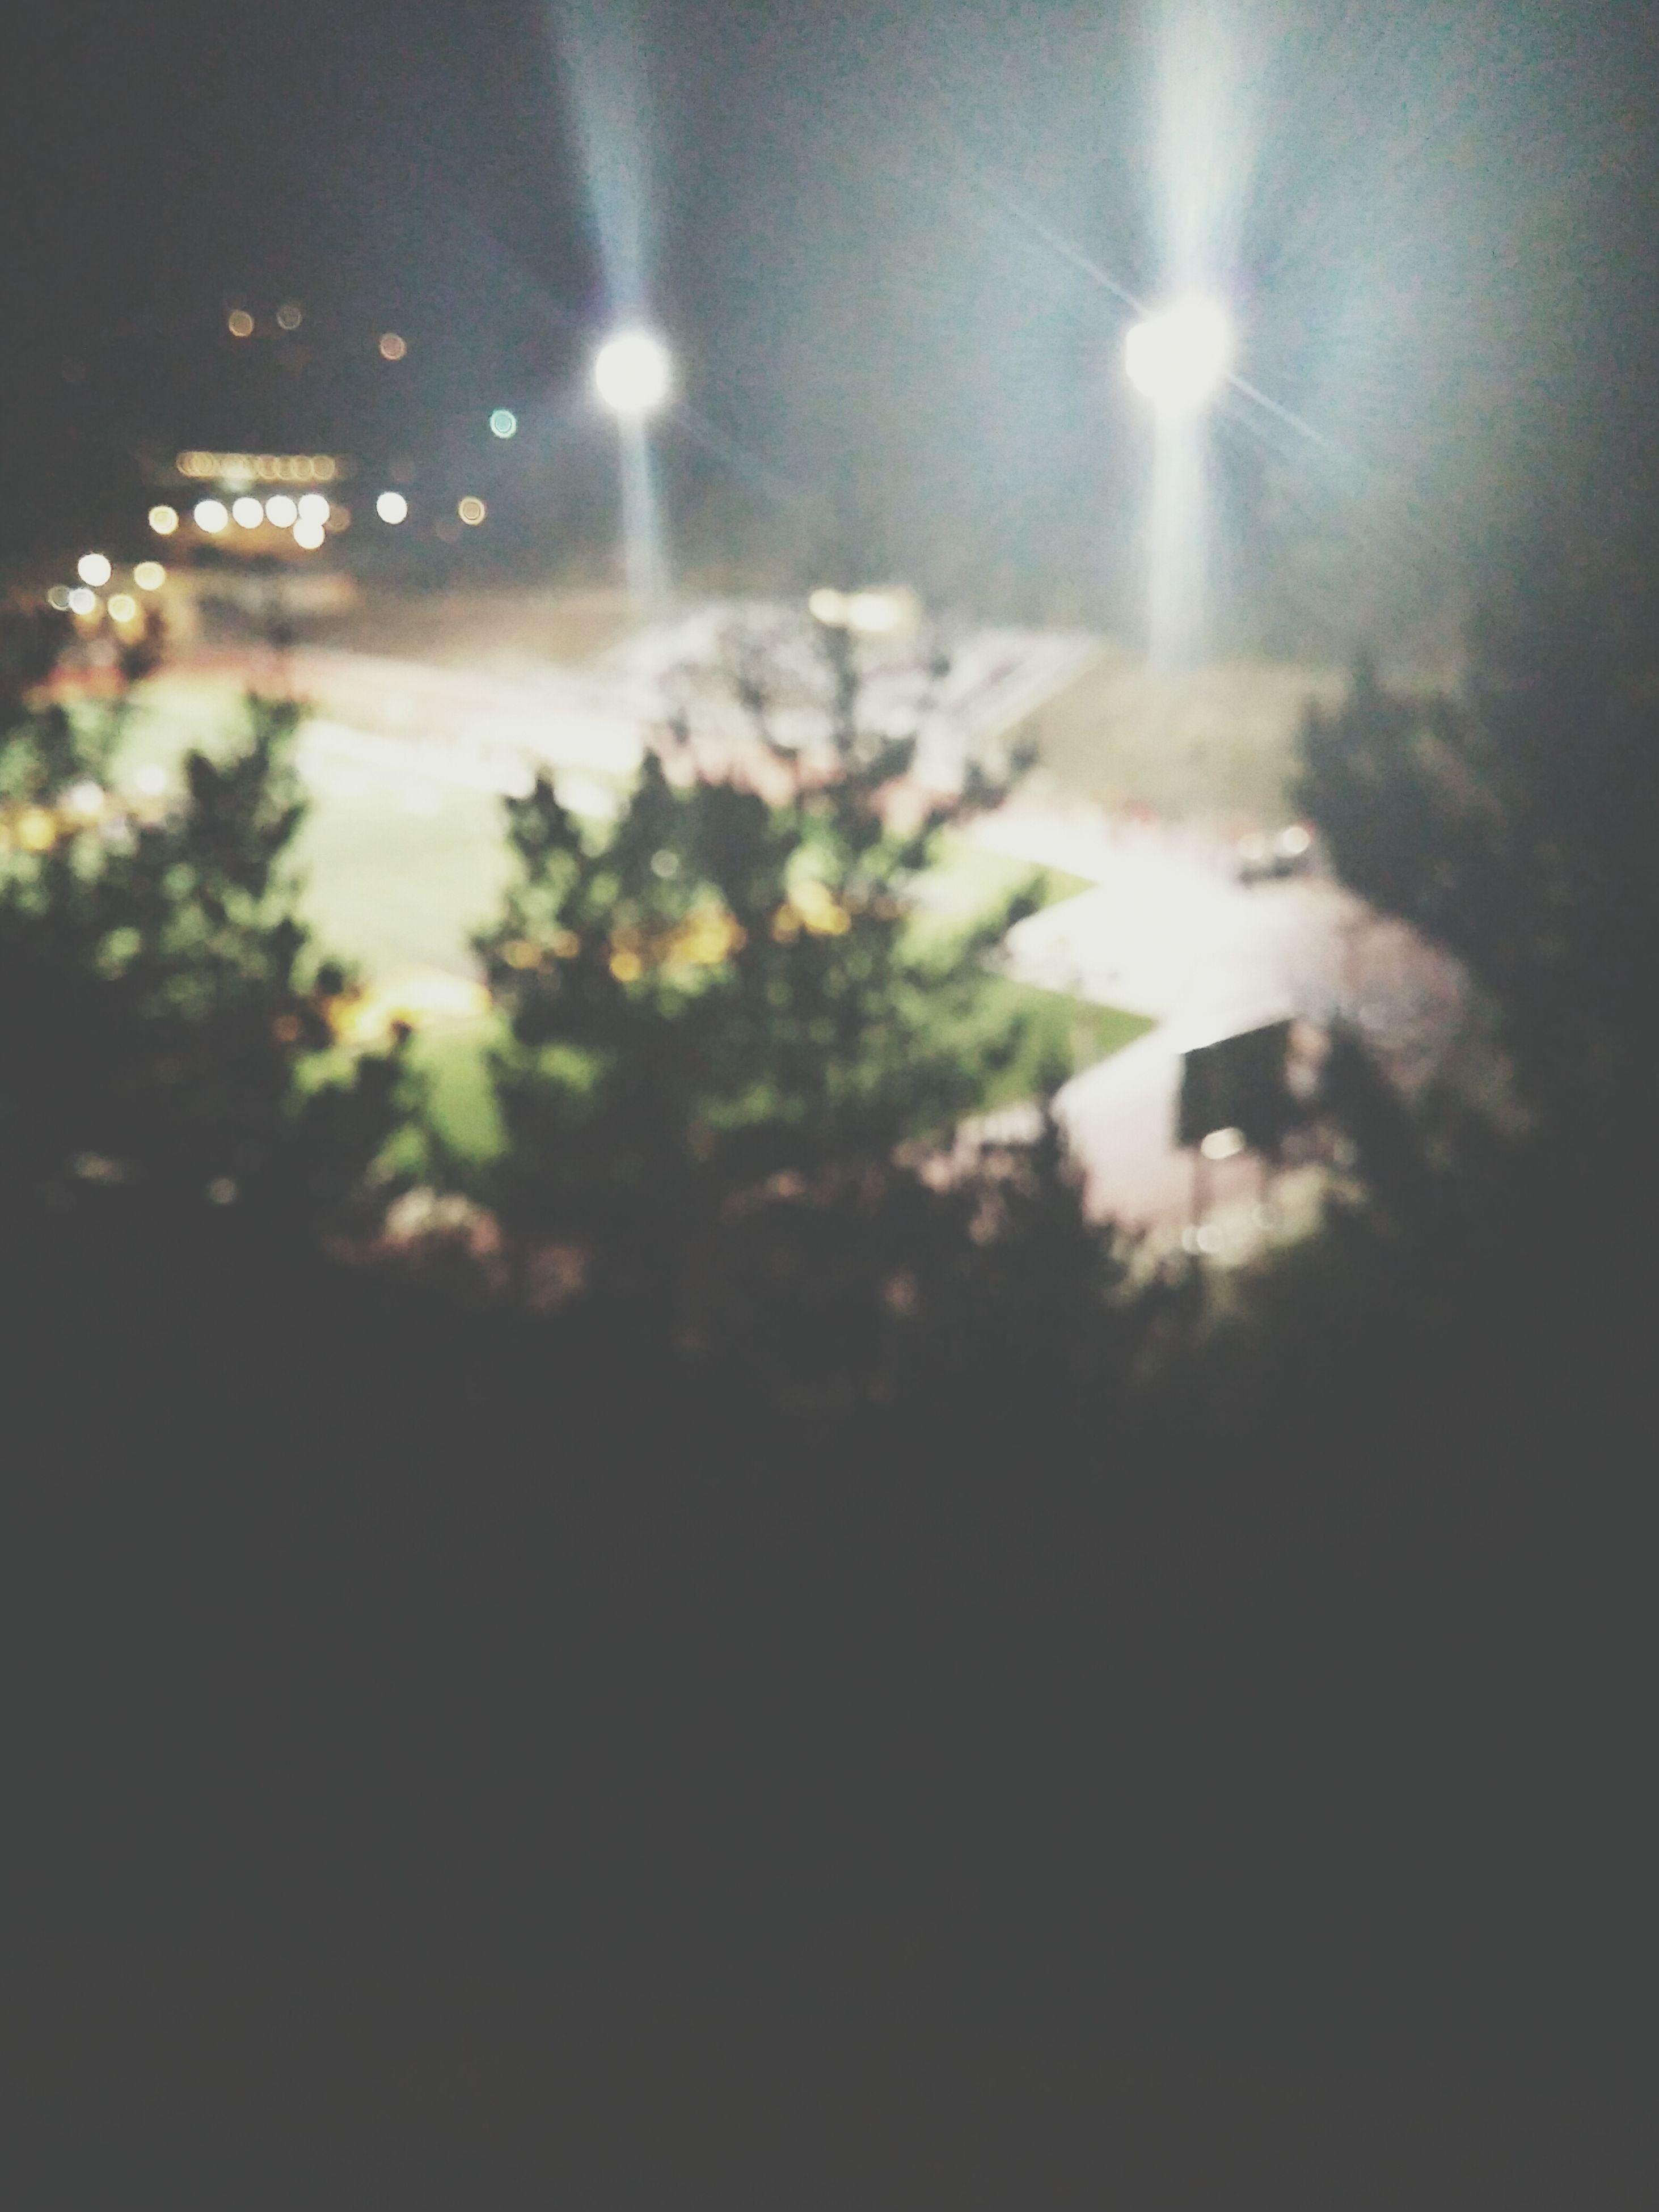 night, illuminated, lens flare, light - natural phenomenon, glowing, dark, sky, outdoors, street light, no people, nature, lighting equipment, defocused, tree, growth, tranquility, city, beauty in nature, sunlight, building exterior